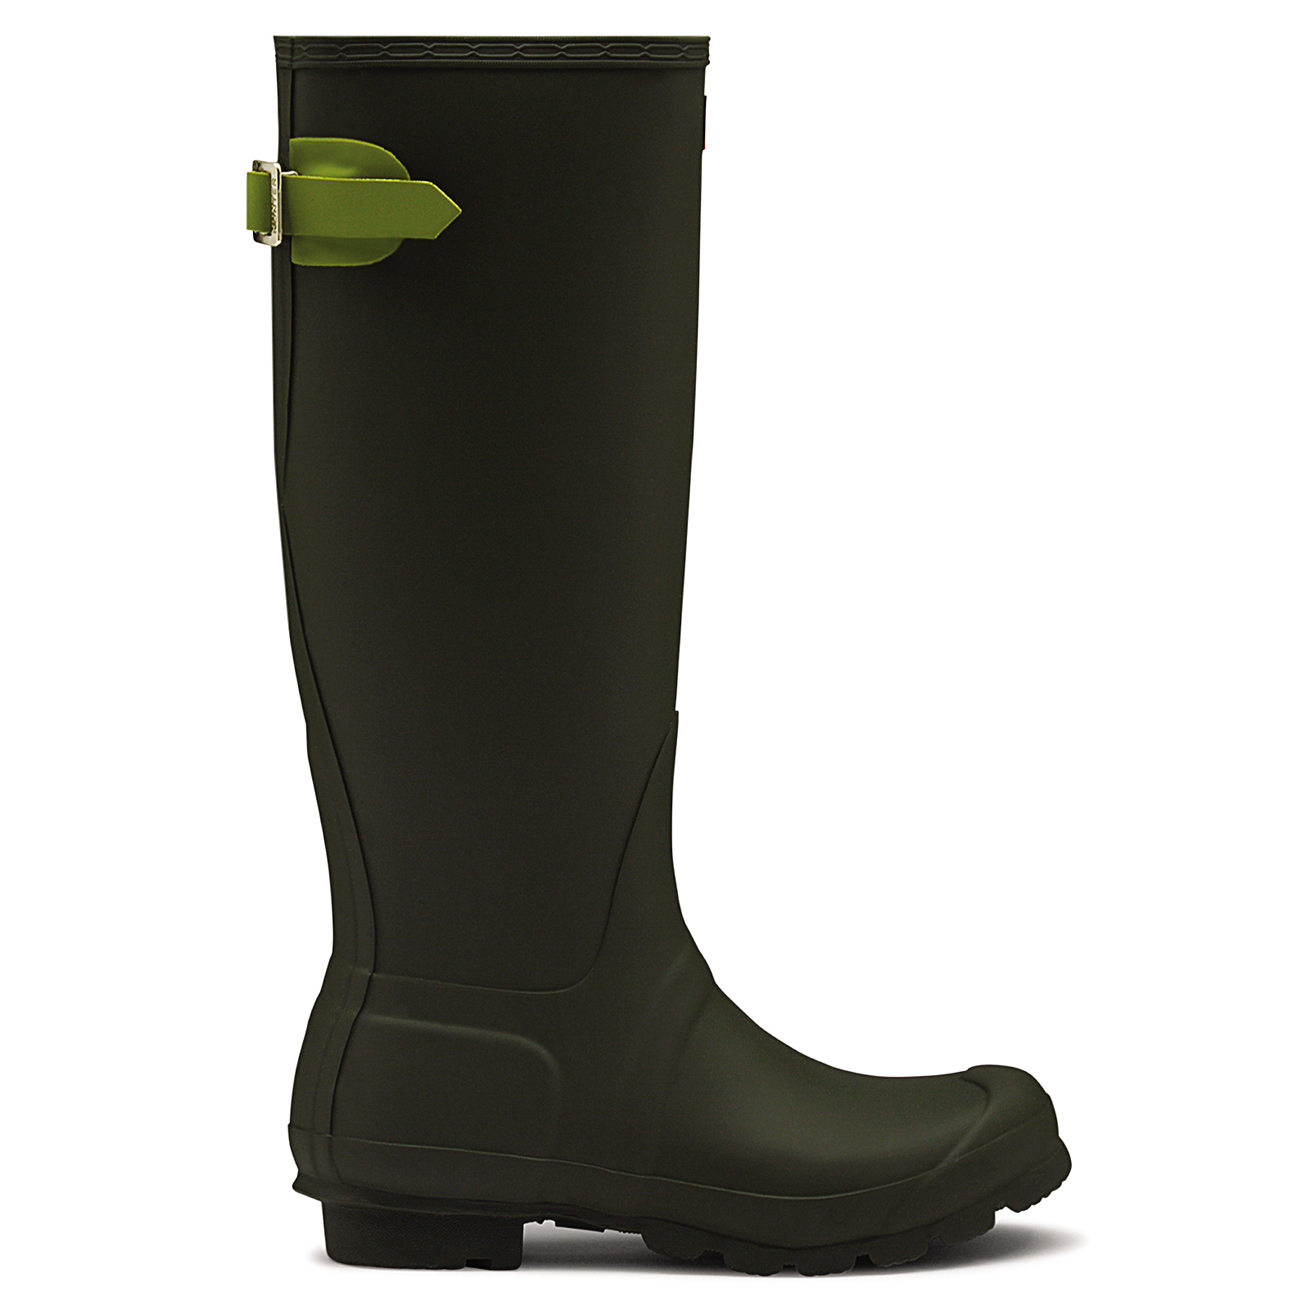 Damen Damen Damen Hunter Adjustable Back Schnee Regen Gummi Wasserdicht Stiefel EU 36-43 38bb9d